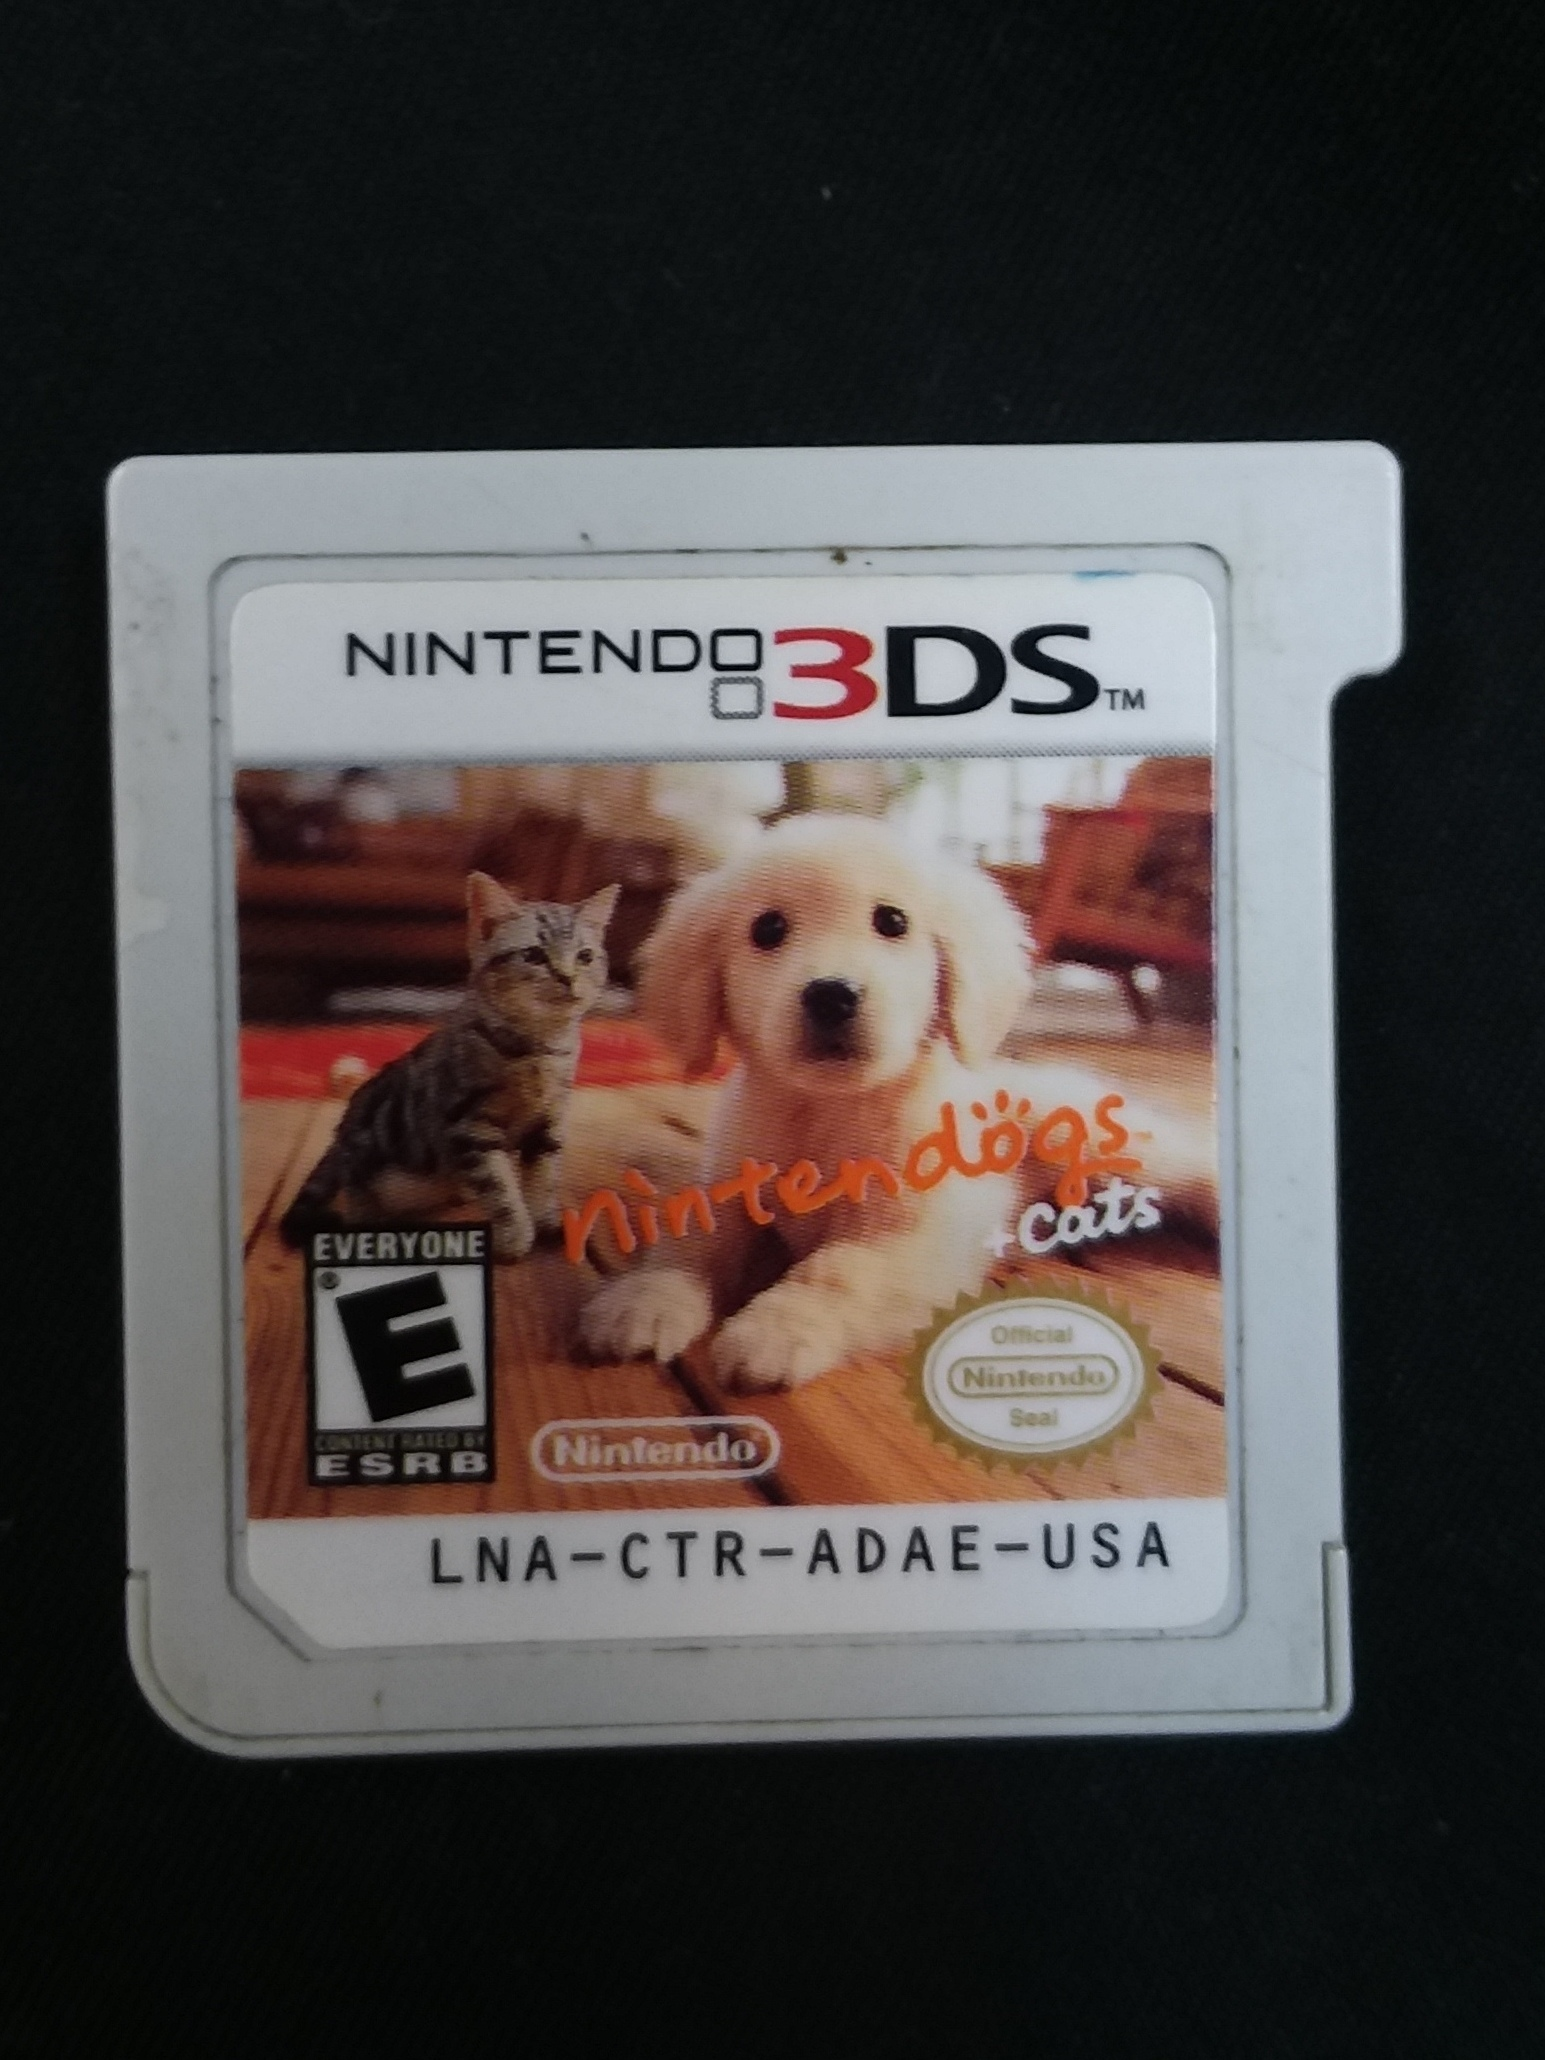 GAMES: NINTENDO 3DS GAME - NINTENDO CATS & LABS